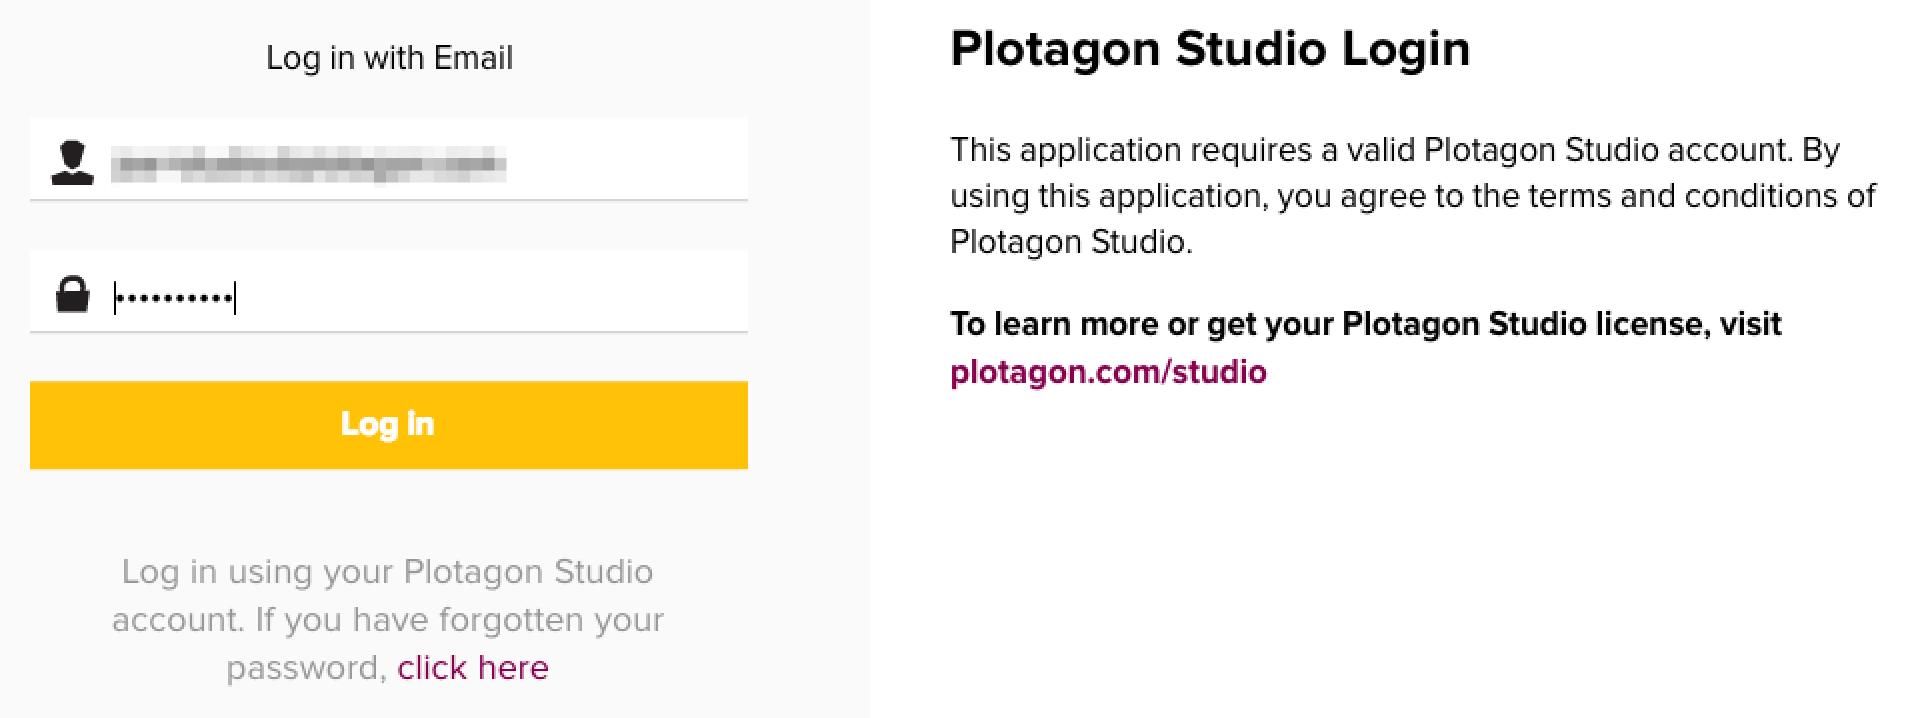 Plotagon Studio login screen